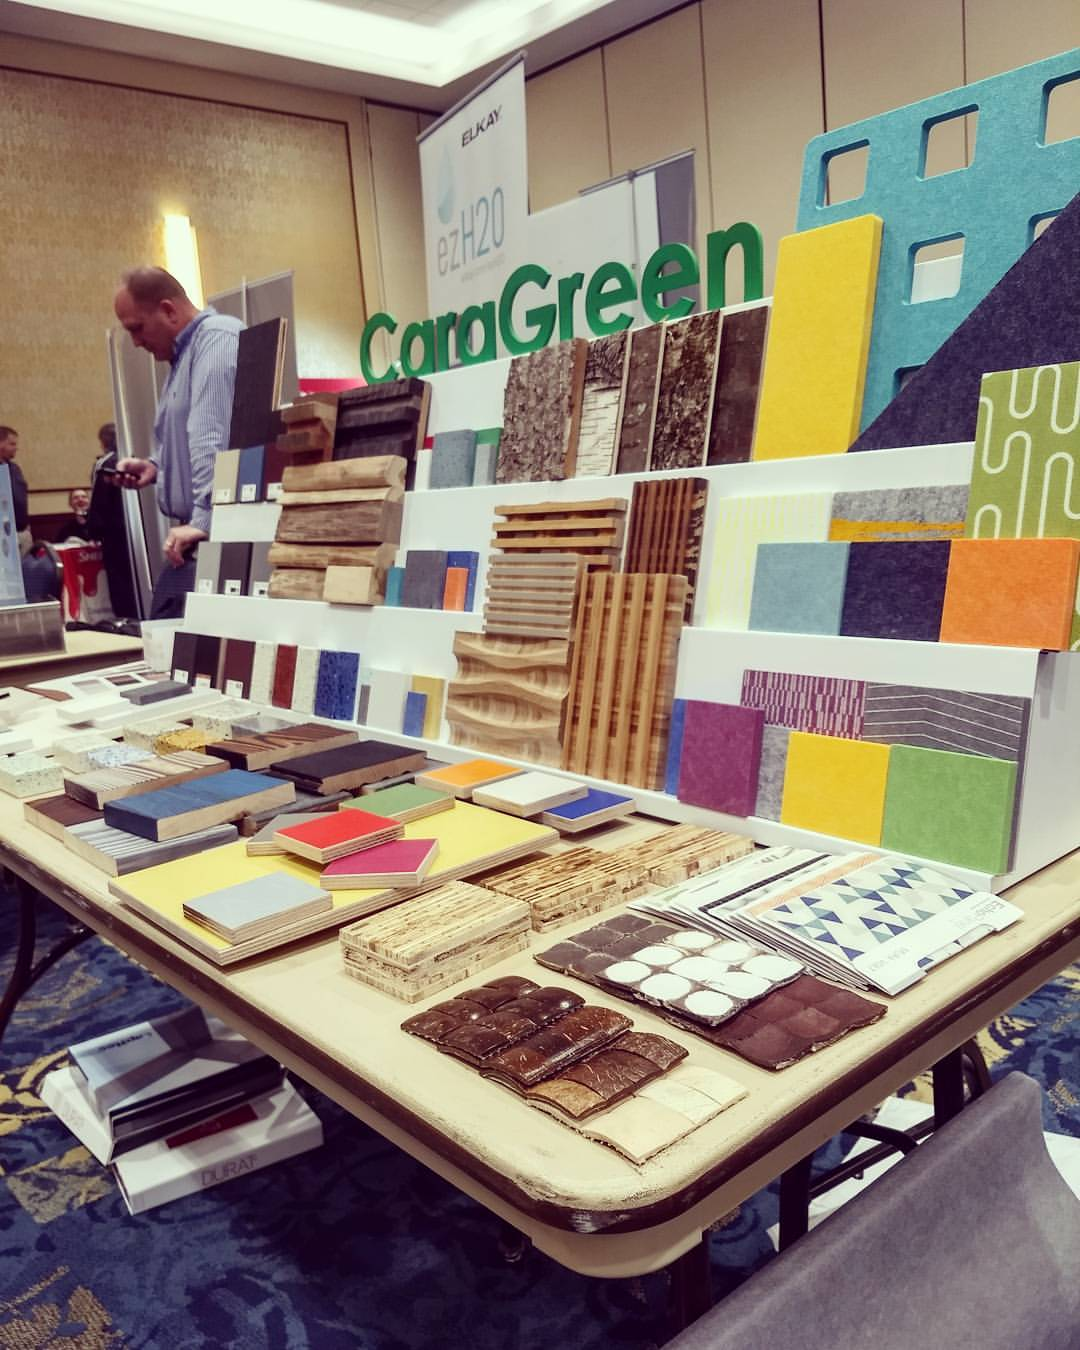 caragreen-green-show